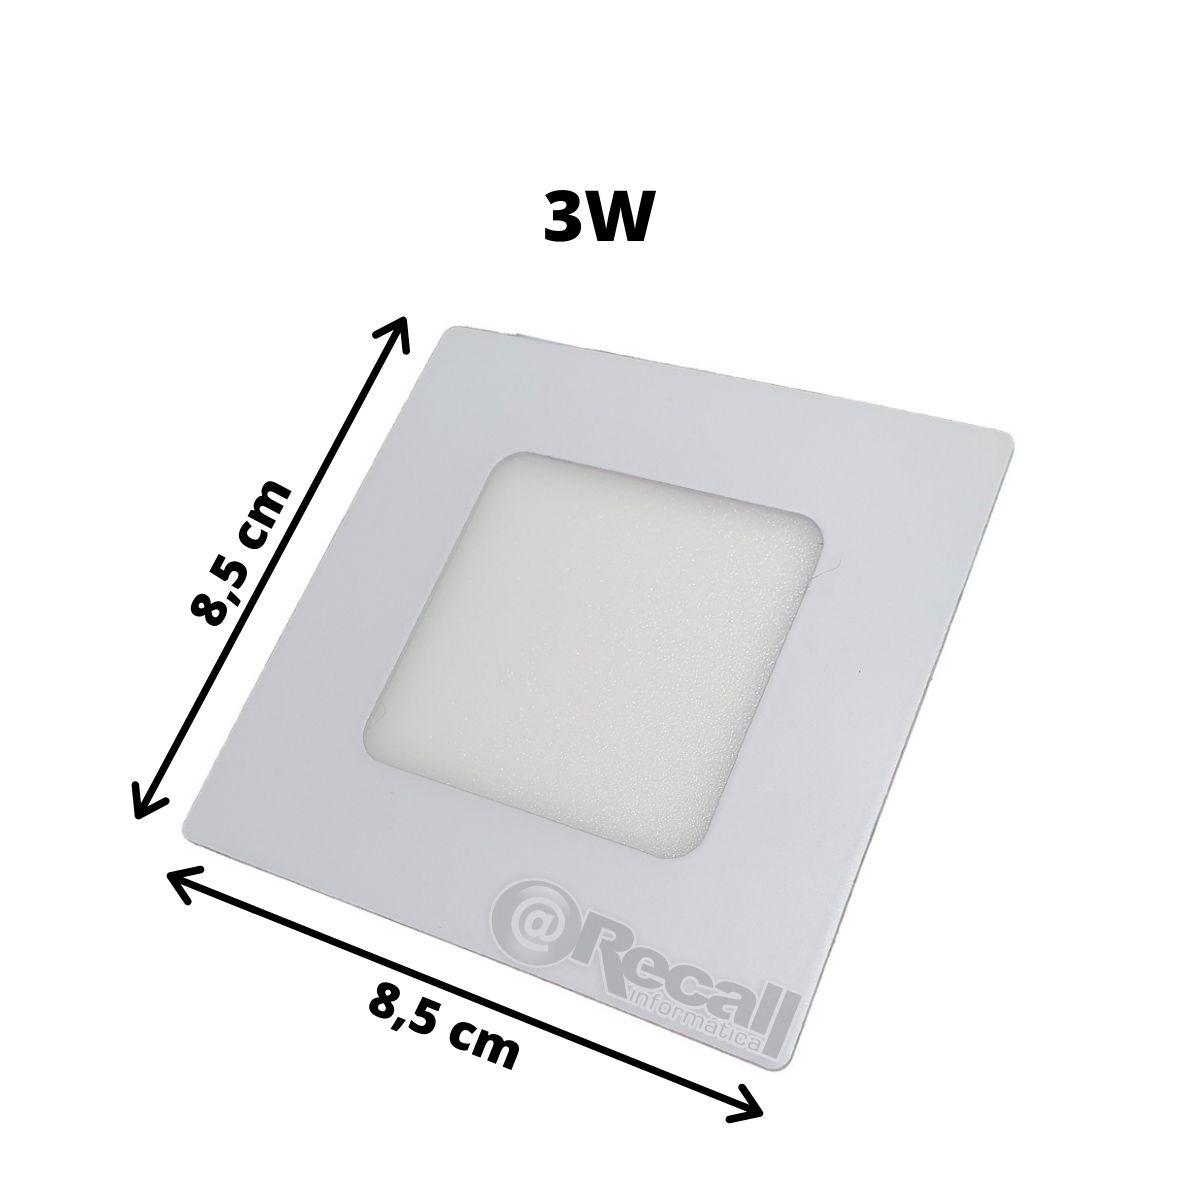 Kit 4 luminaria 3W LED embutir gesso Luz fria 6500k